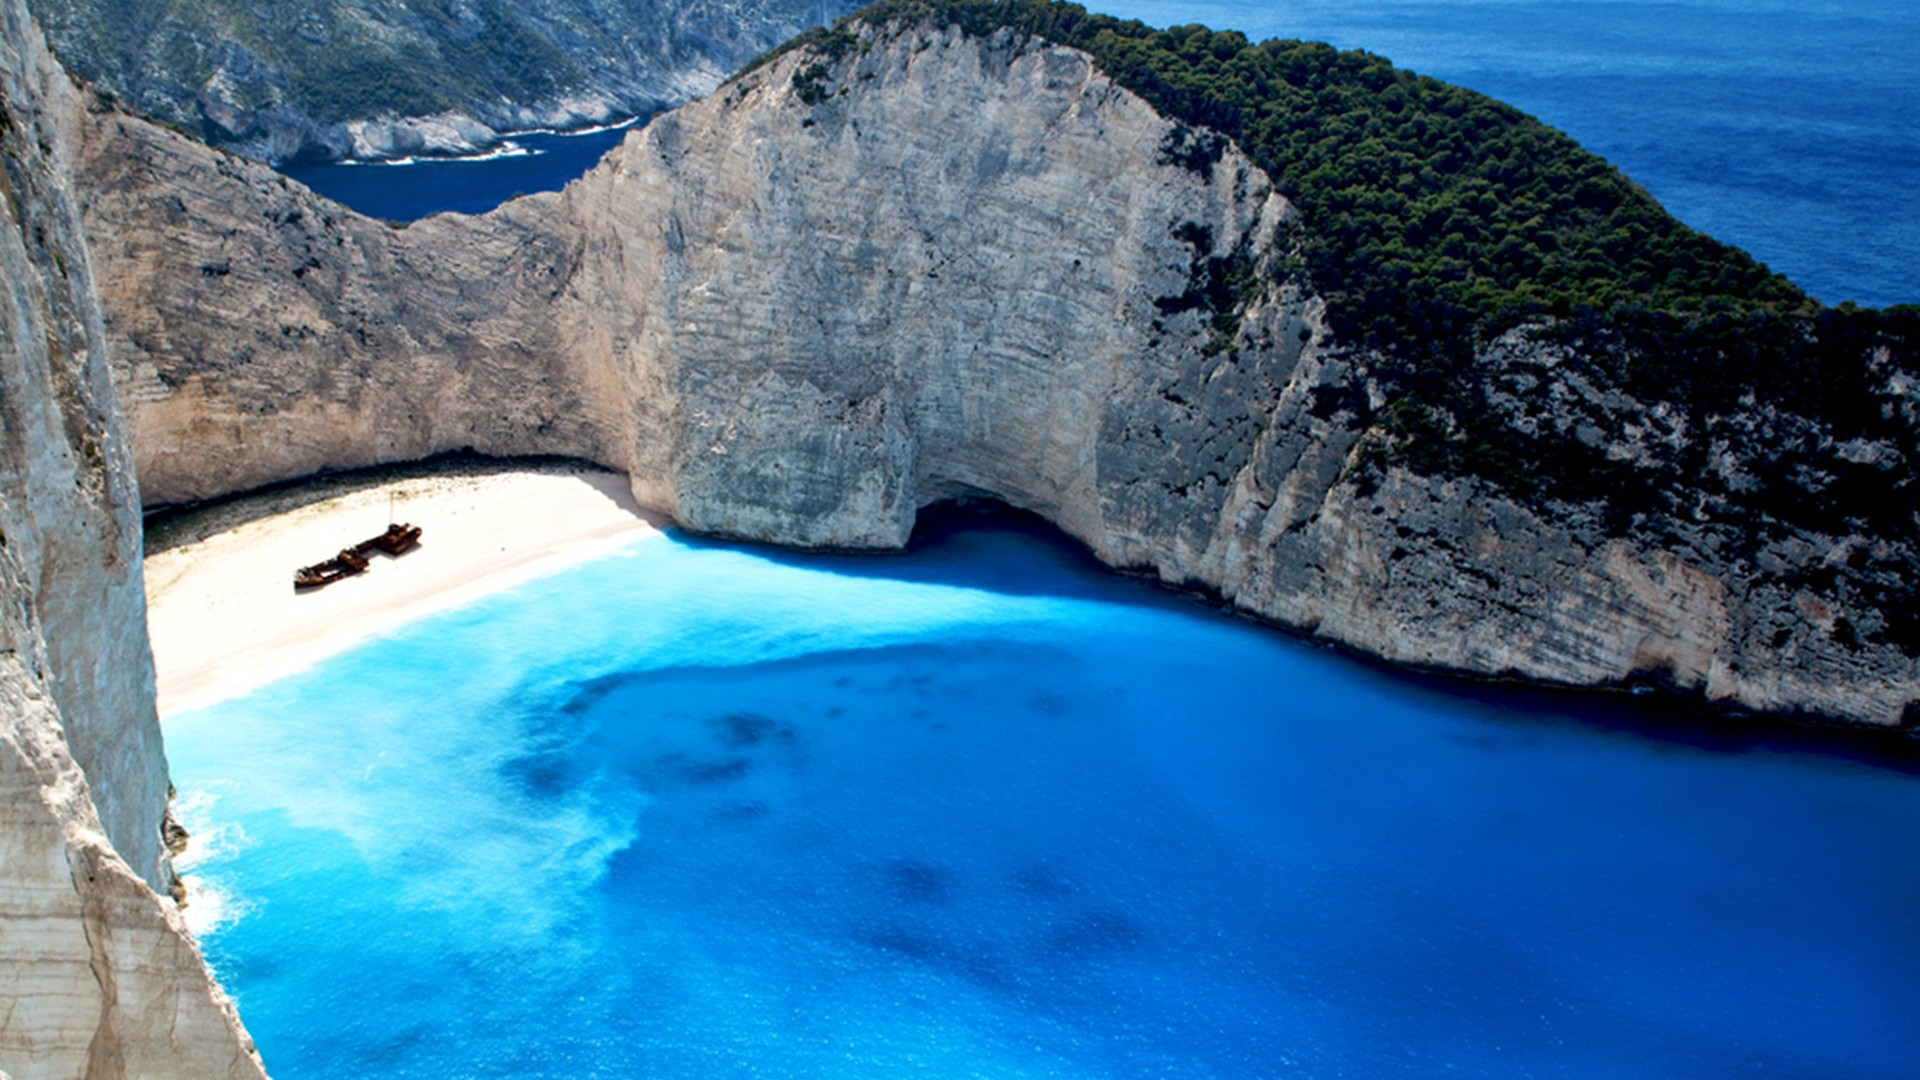 Blue Caves Zakynthos Island Greece Desktop Wallpaper 27152   Baltana 1920x1080